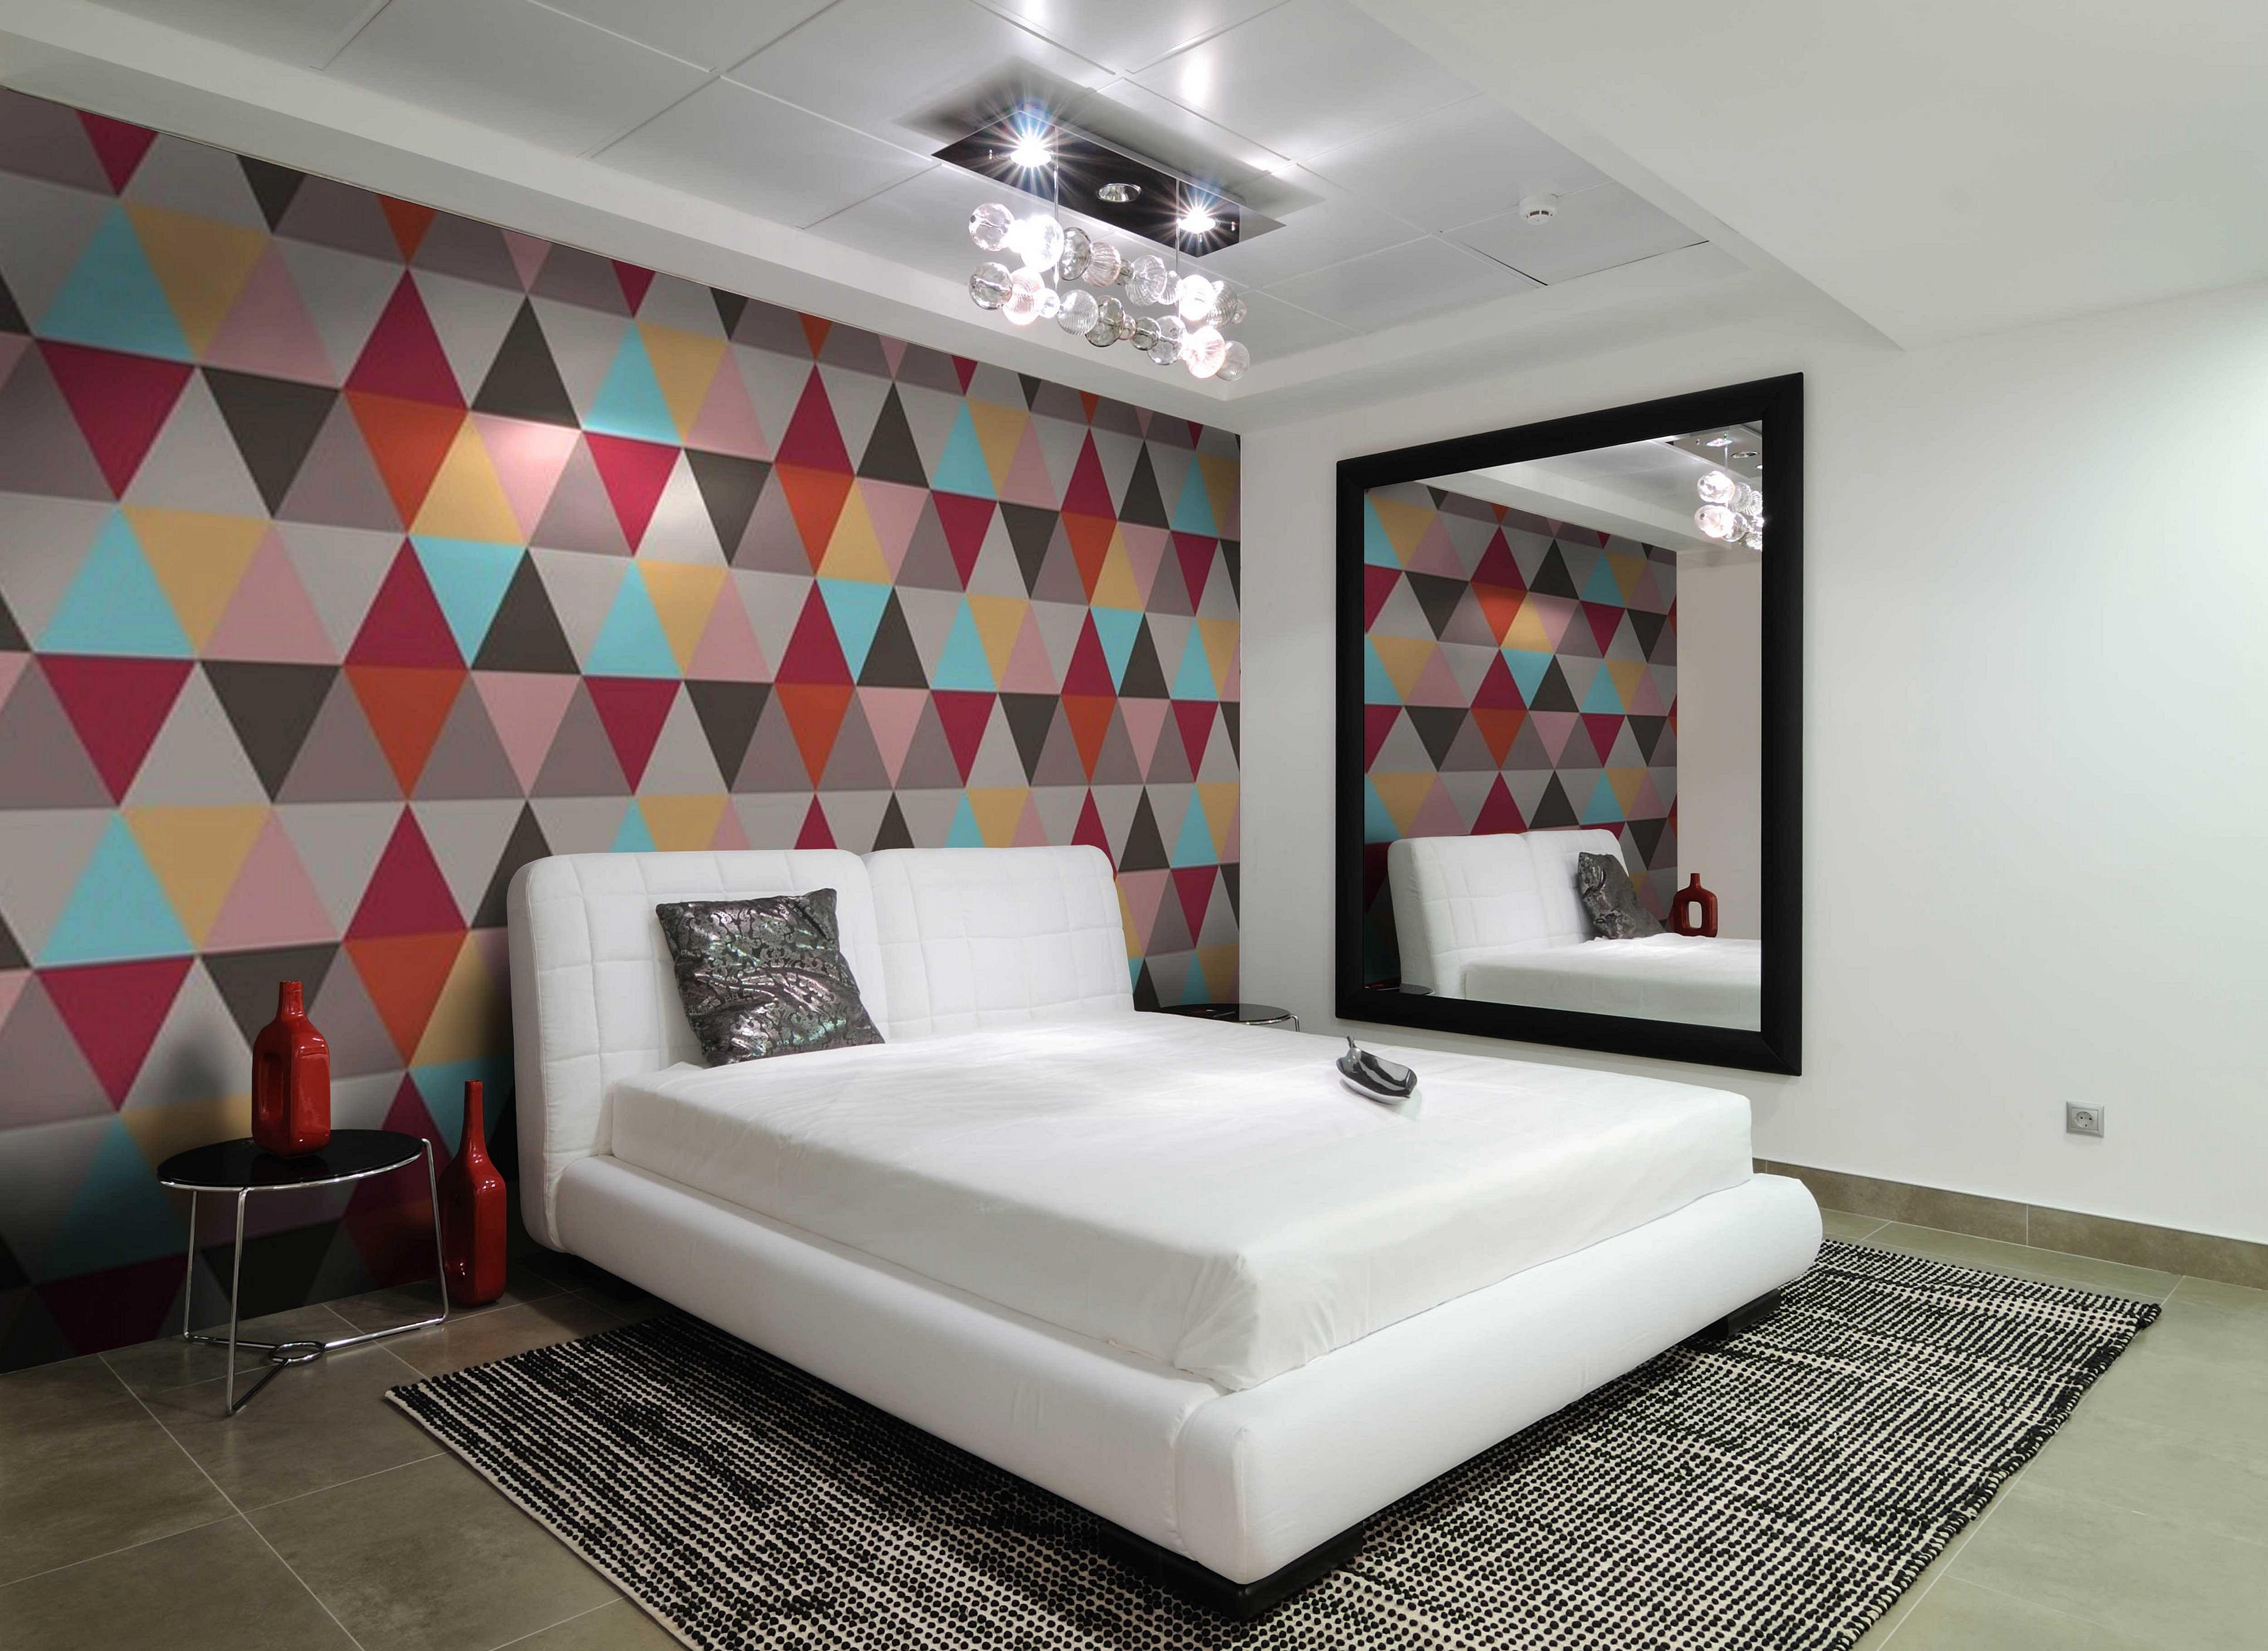 Nice 22 Gorgeous Bedroom Wallpaper Decoration Ideas For Inspirations Https Bosidolot Com Spring Bedroom Decor Wallpaper Bedroom Wallpaper Design For Bedroom